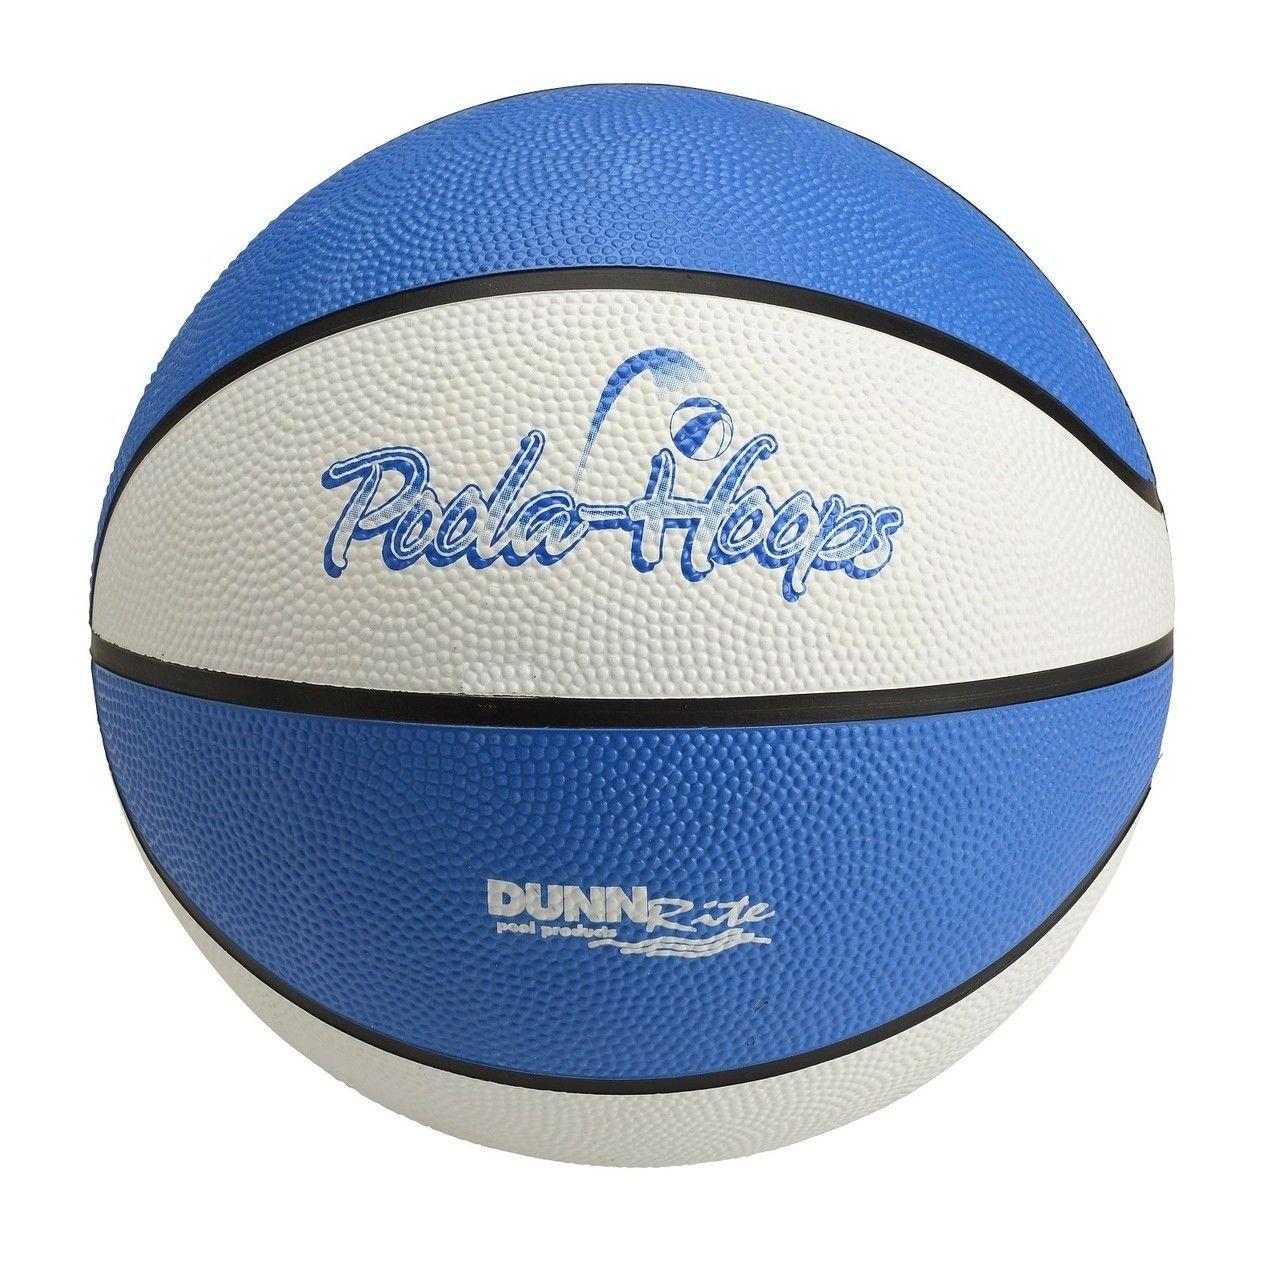 Poola Hoop Ball 9 Dia B130 Pool Basketball Pool Water Portable Pools